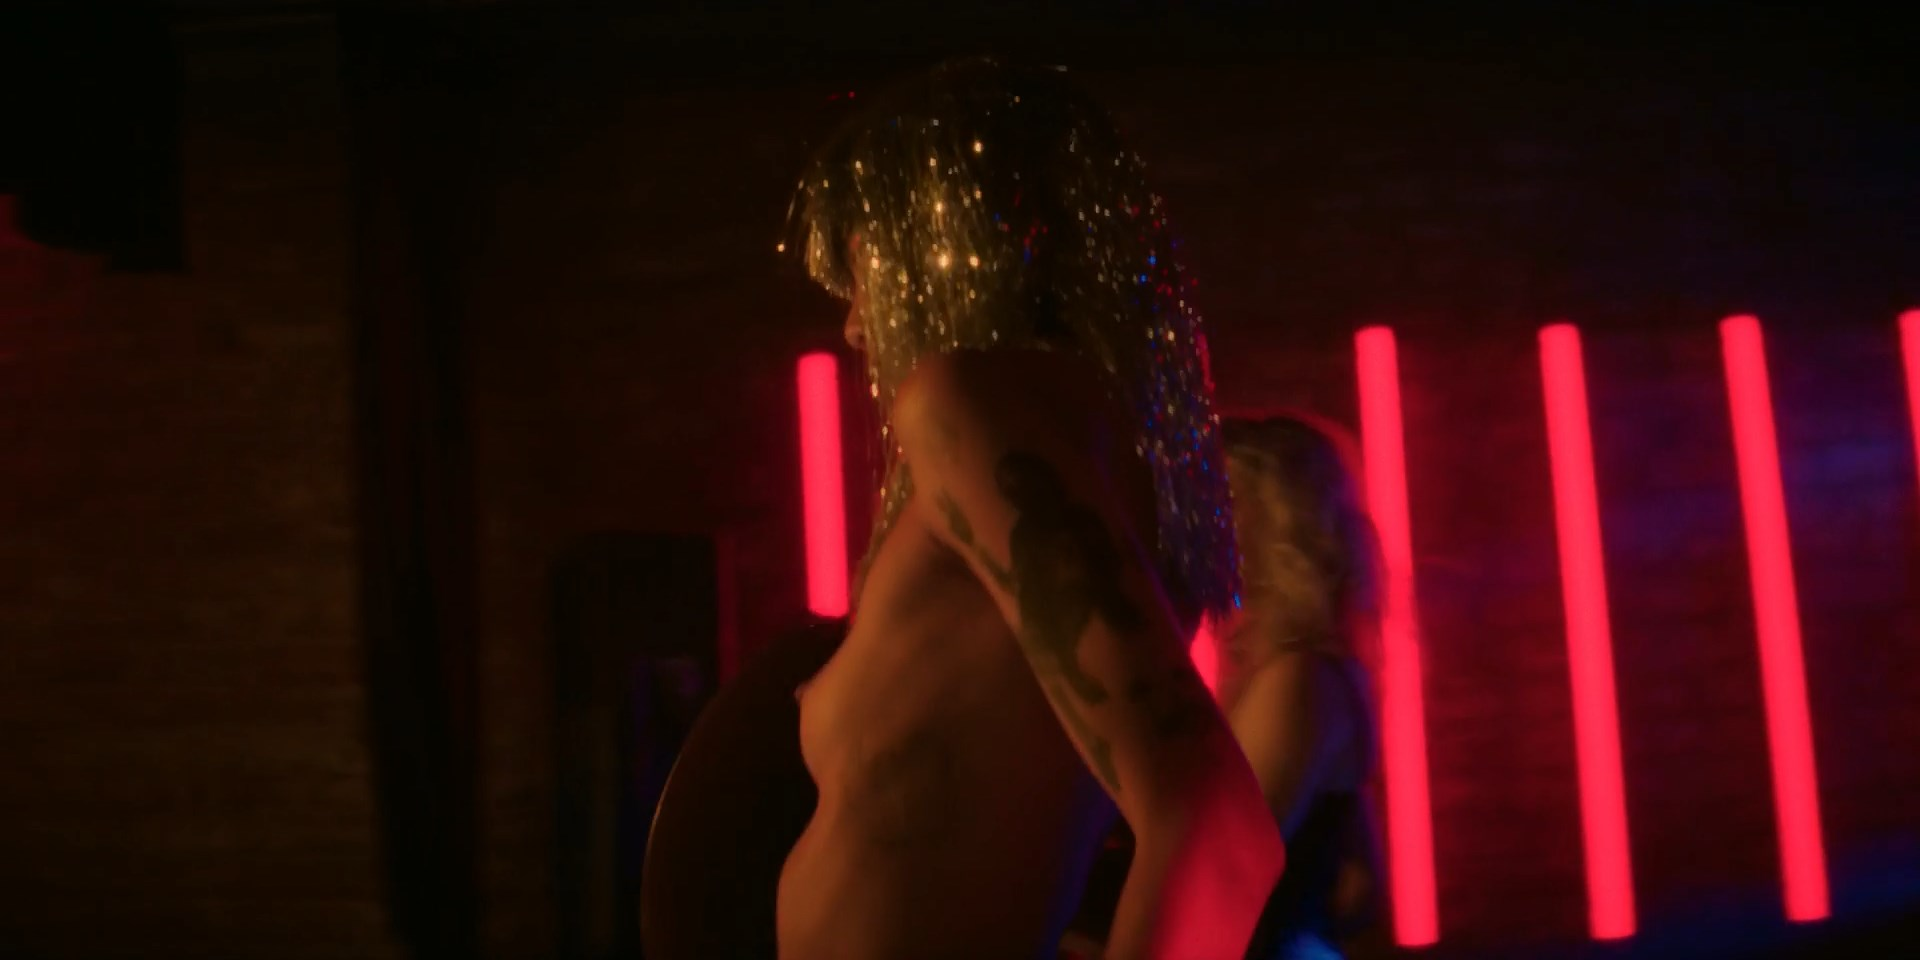 May Hongk nude - Tales of the City s01-02 (2019)